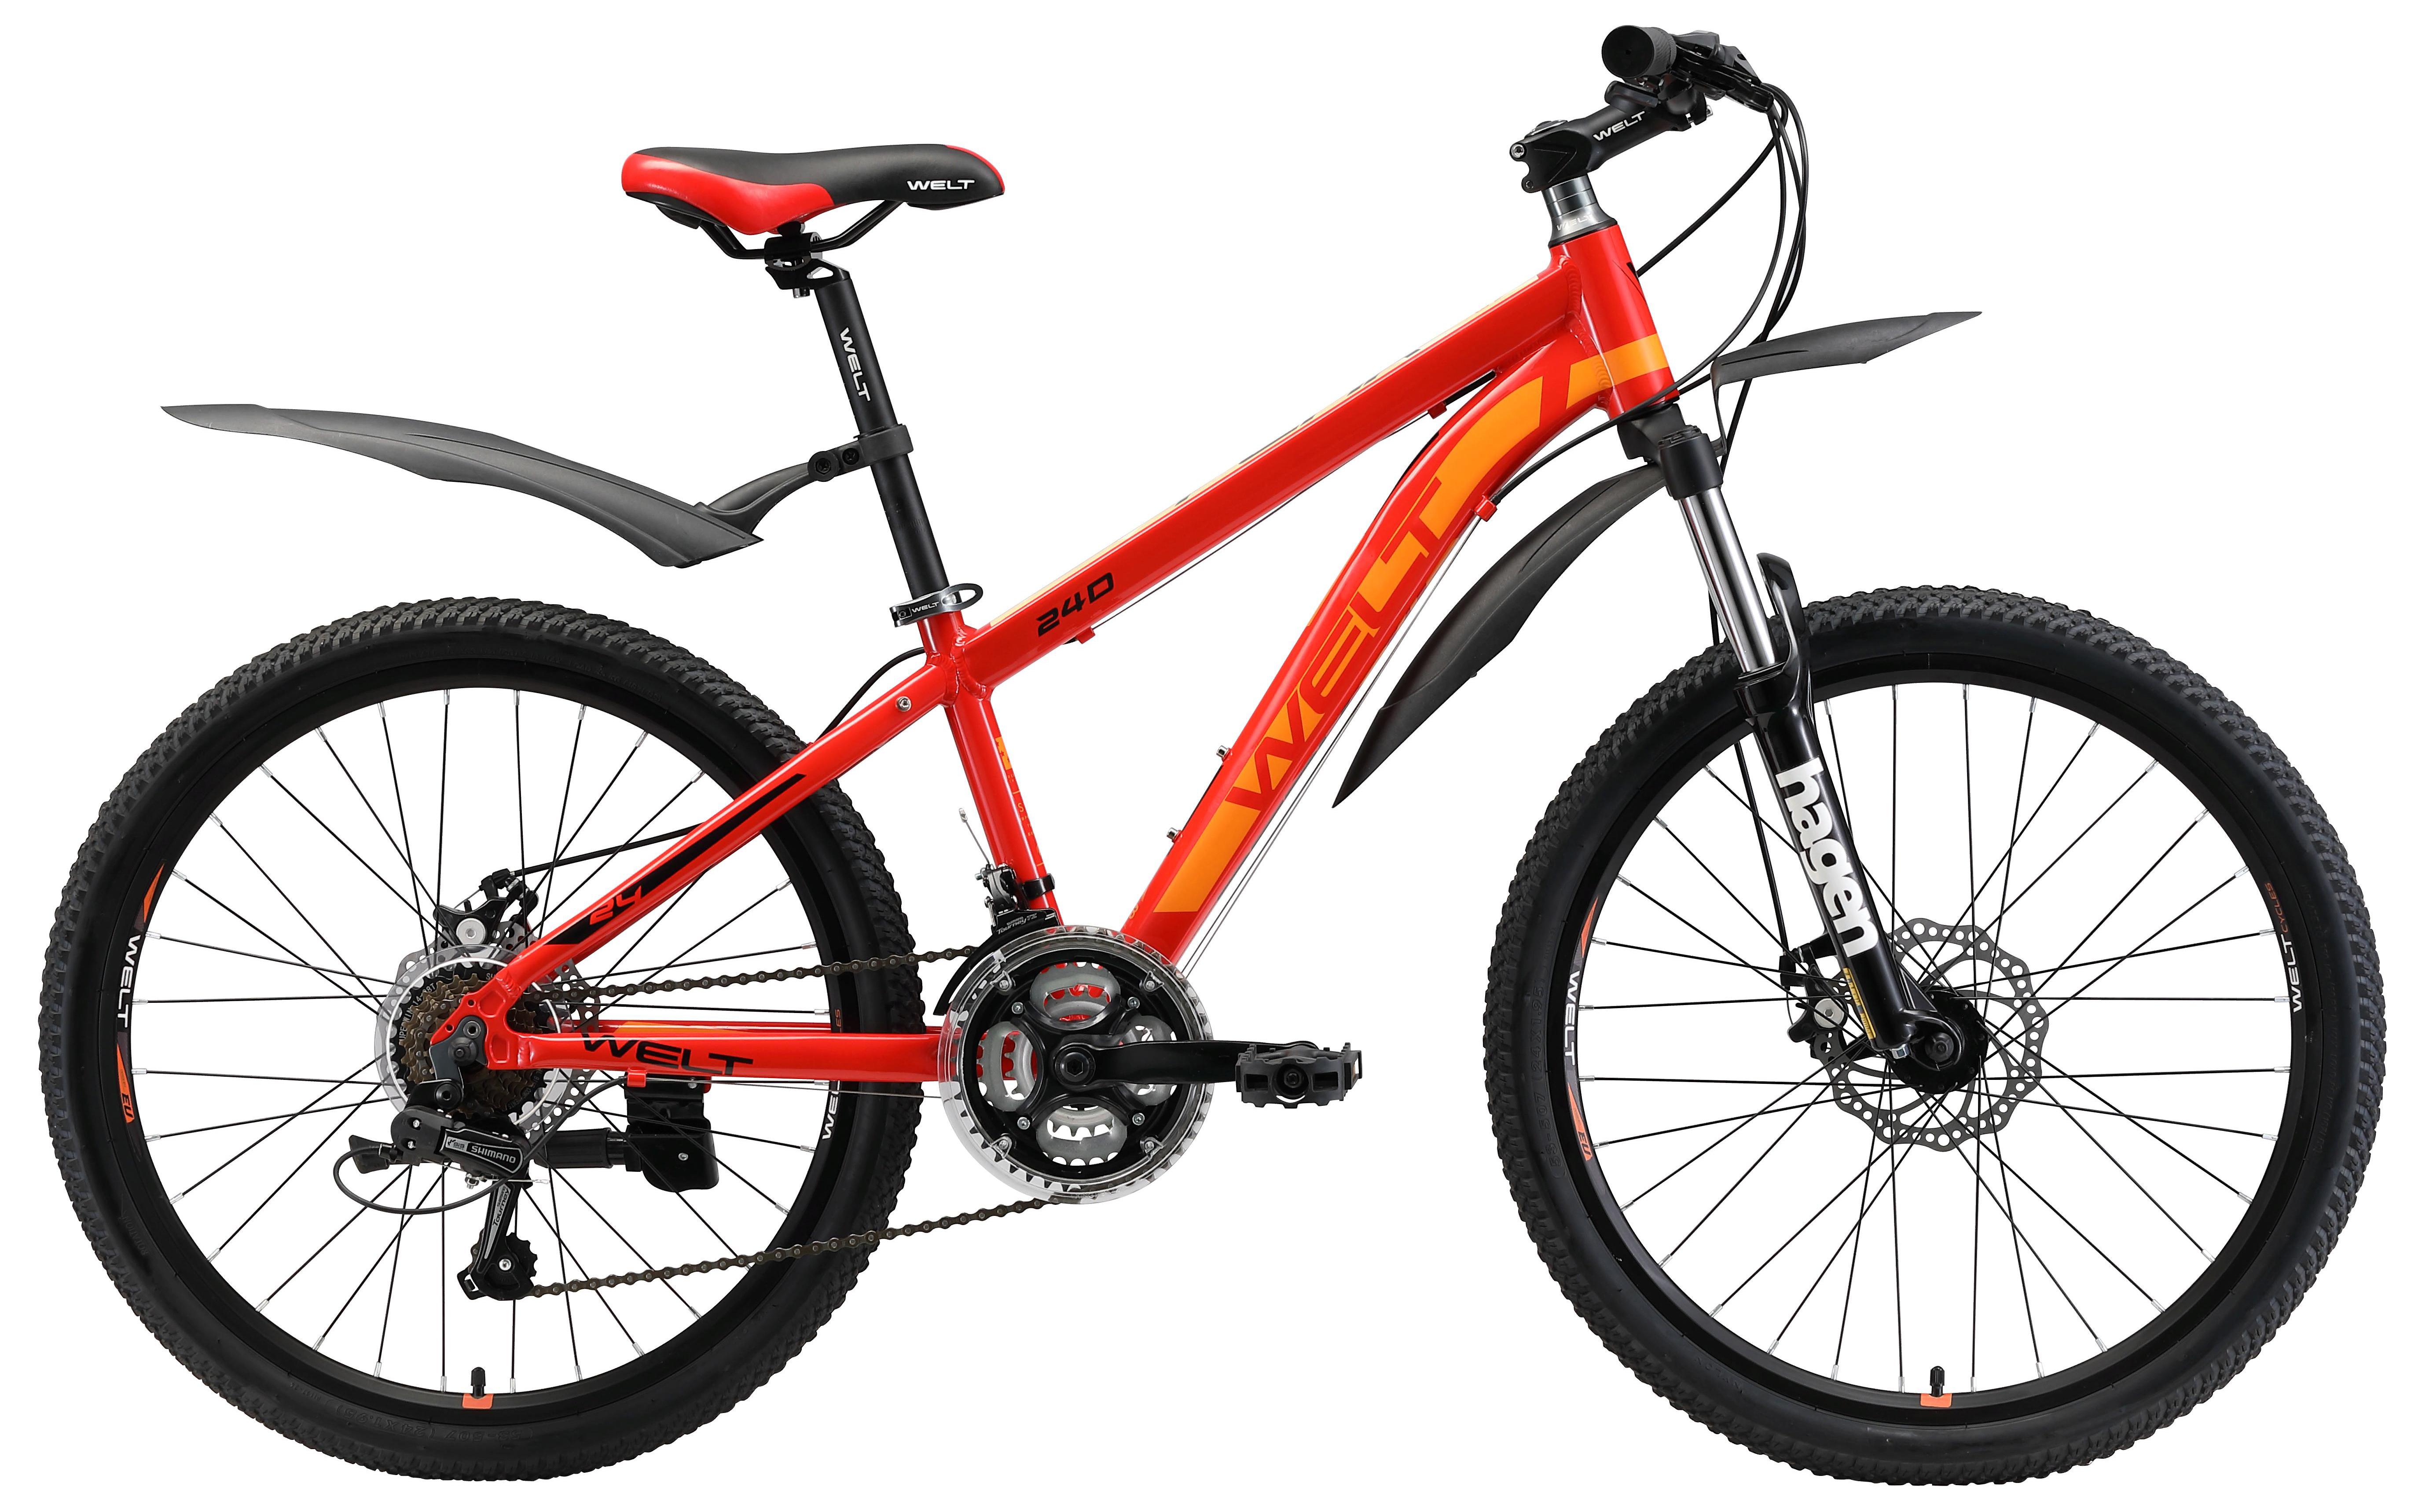 Велосипед Welt Peak 24 Disc 2019 велосипед welt ridge 1 0 hd 2018